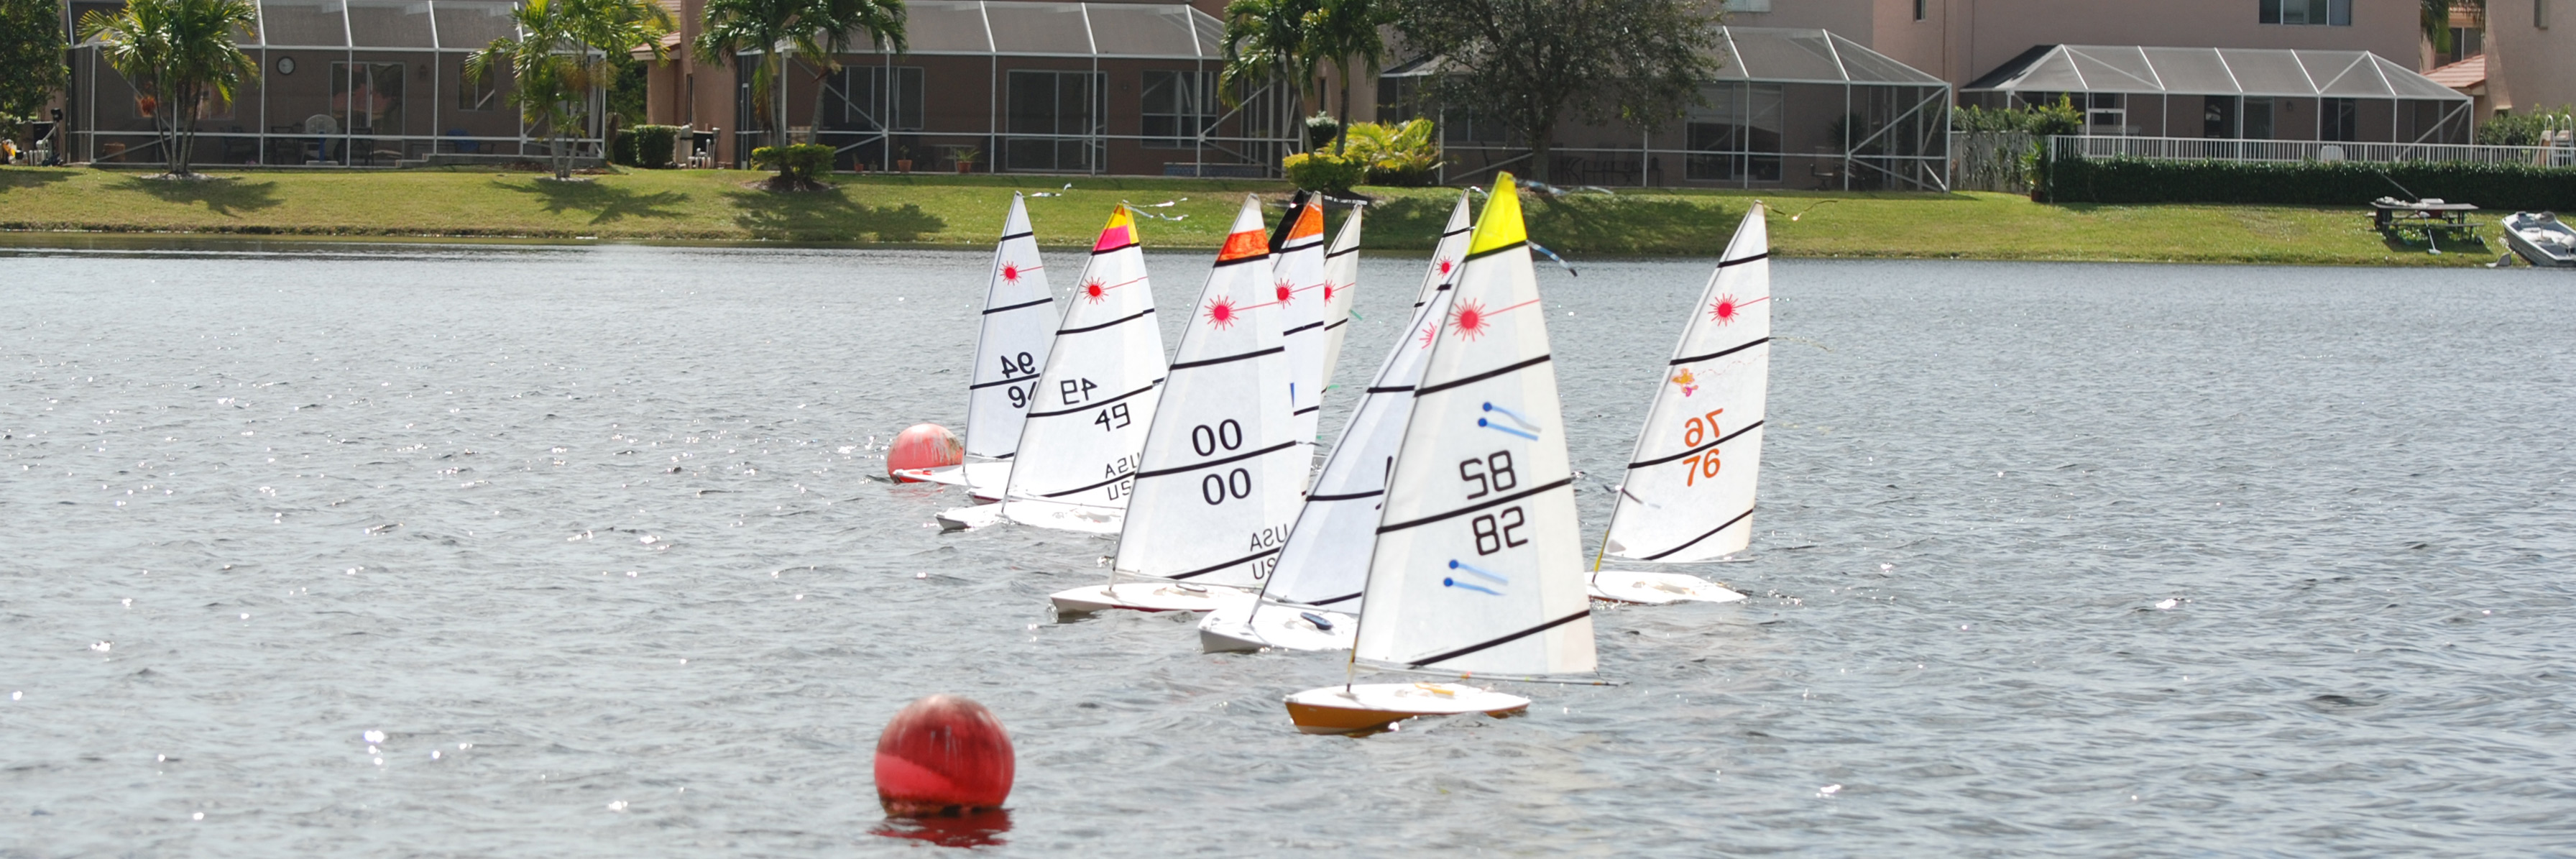 Local Loesel Wins Se Florida Winter Rc Laser Regatta Rc